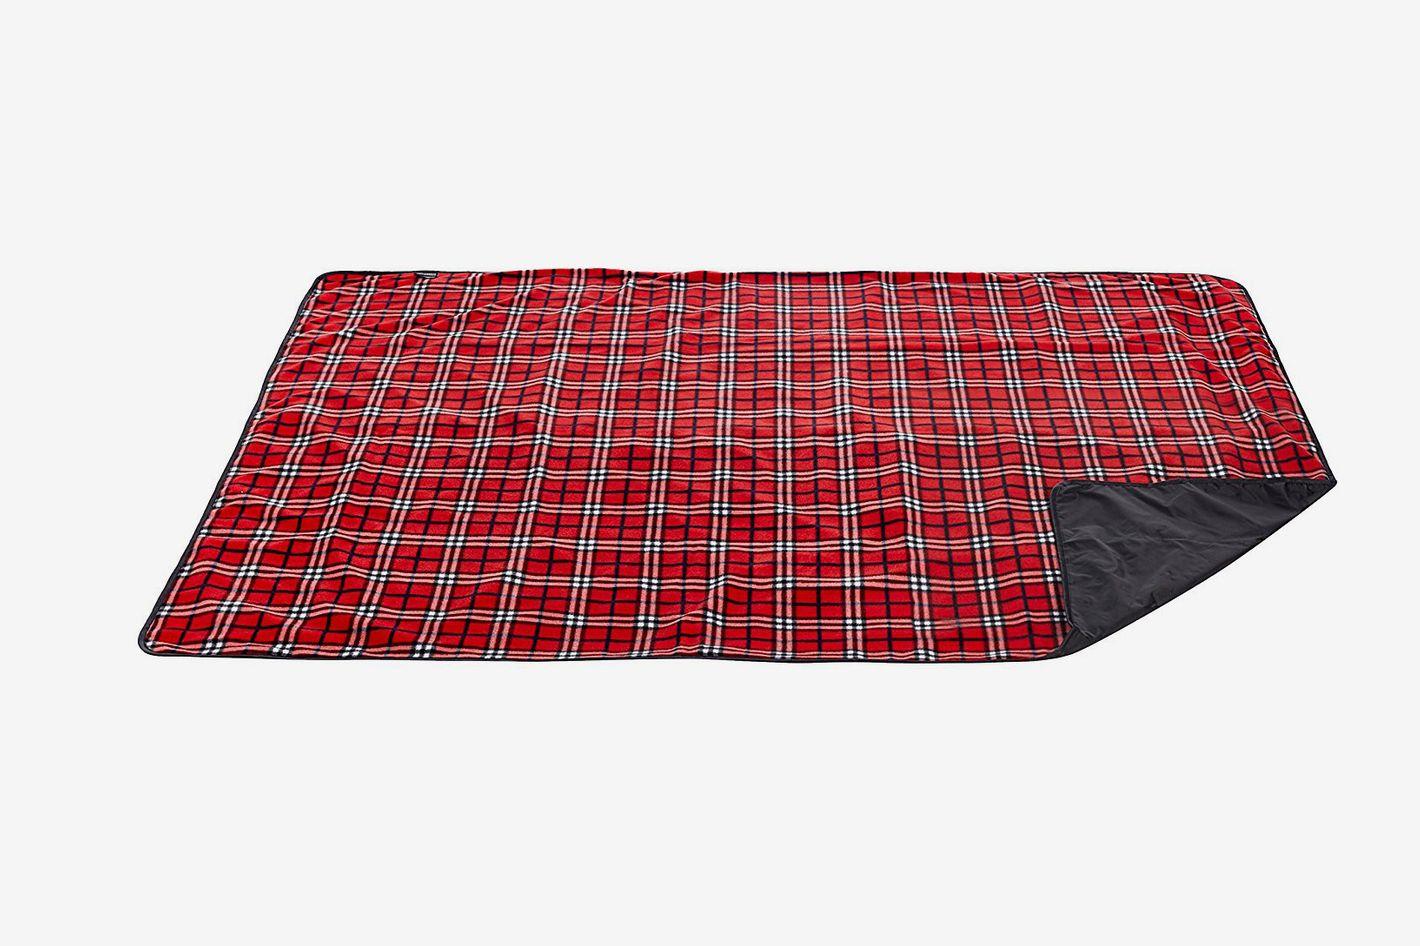 14 Best Weighted Blankets 2018